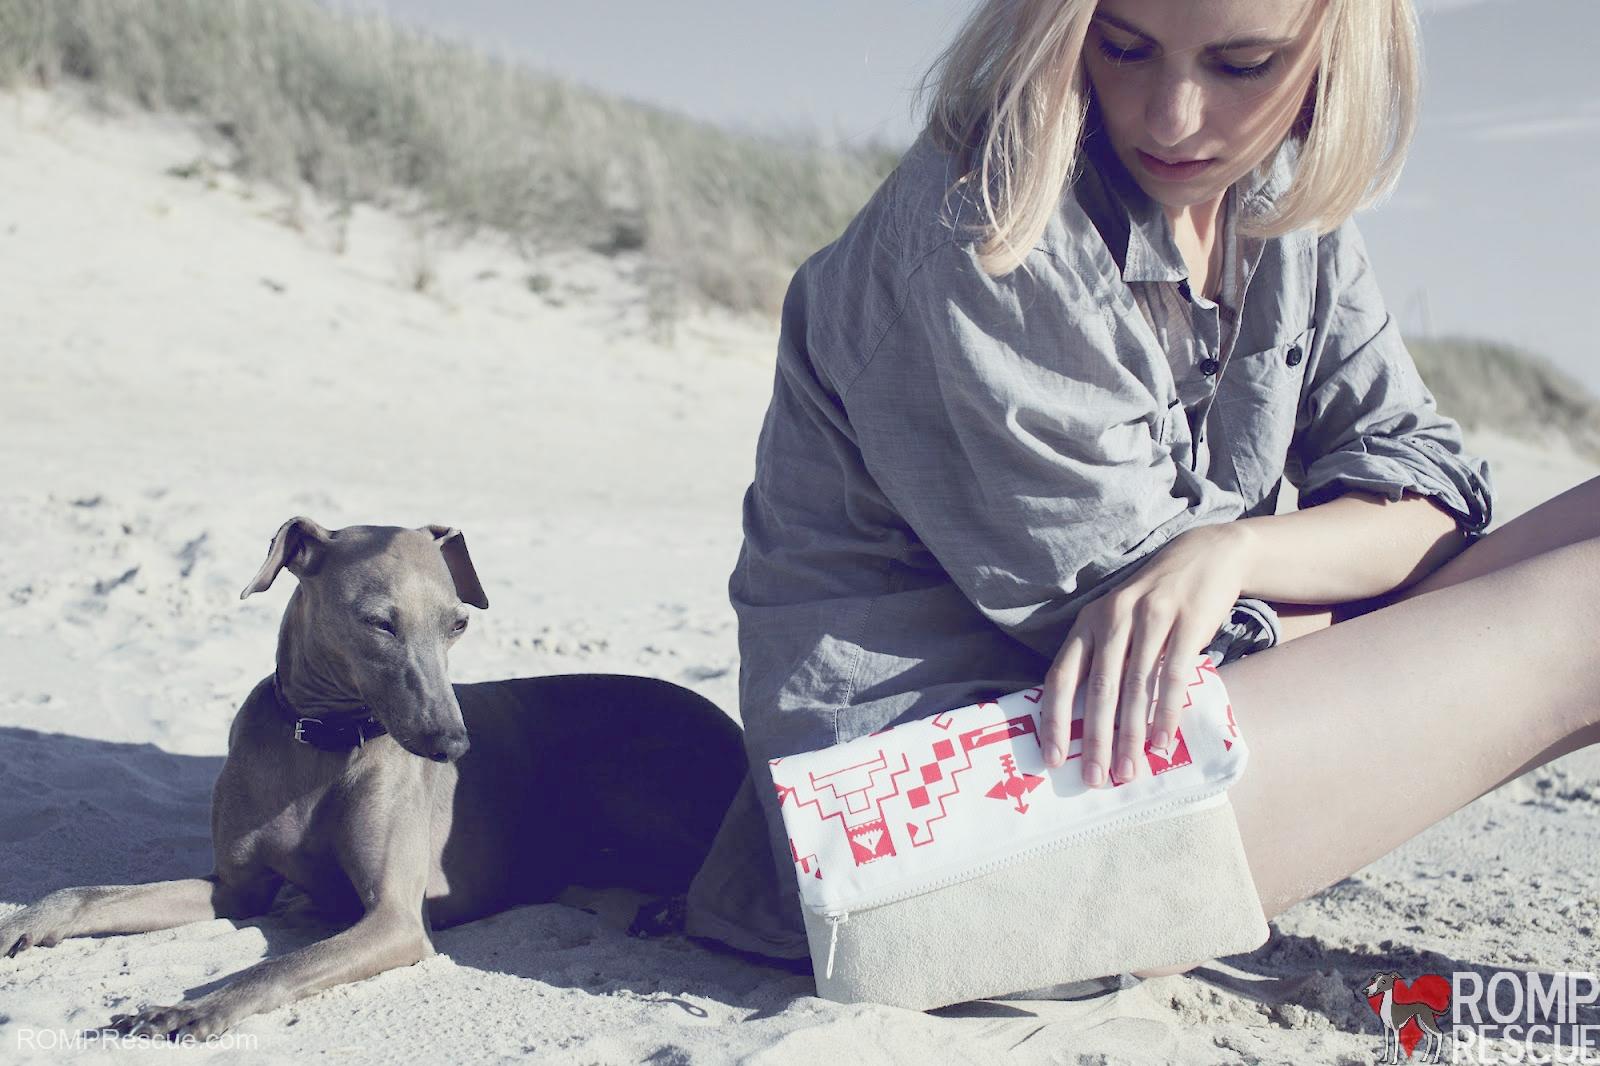 dog beach, montrose beach, montrose dog beach, dog beach meetup, chicago dog beach, chicago dog beaches, chicago dog friendly beaches, dog friendly beaches, chicago italian greyhound dog beach, italian greyhound beach, italian greyhound dog beach, itailan greyhound water, italian greyhound lake, italian greyhound swim, italian greyhound swimming, illinois dog beaches, illinois dog beach, Italian Greyhound Meetup, Dog beach playdate, dog beach play date, chicago italian greyhound, chicago, chicago dog playdate, chicago dog meetup, chicago dog play date, chicago dog meet up, chicago italian greyhound play date, chicago italian greyhound playdate, chicago italian greyhound meetup, chicago italian greyhound meet up, italian greyhound sand, italian greyhound fashion, italian greyhound